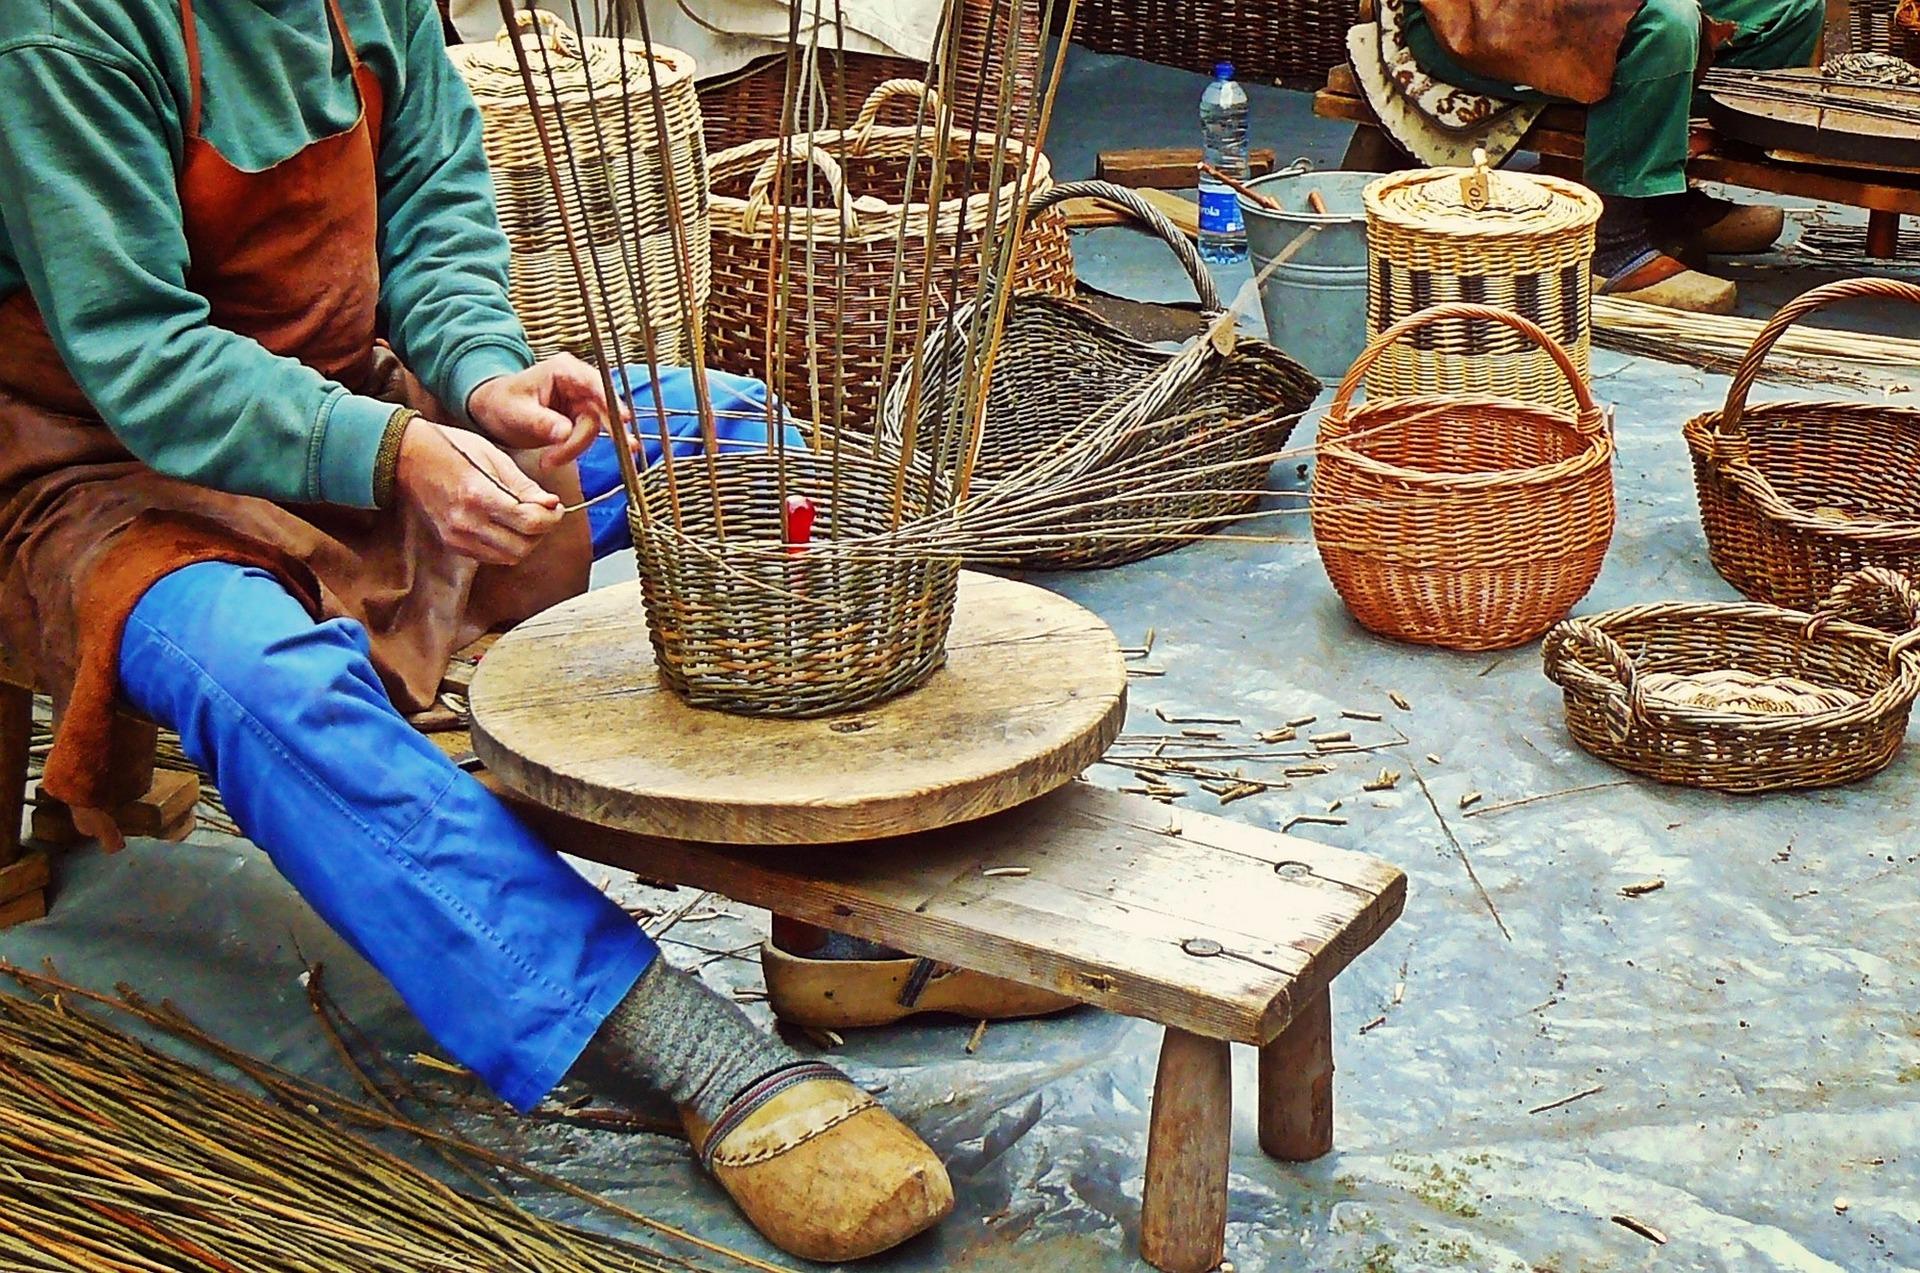 Sunday august 16 - Craft market